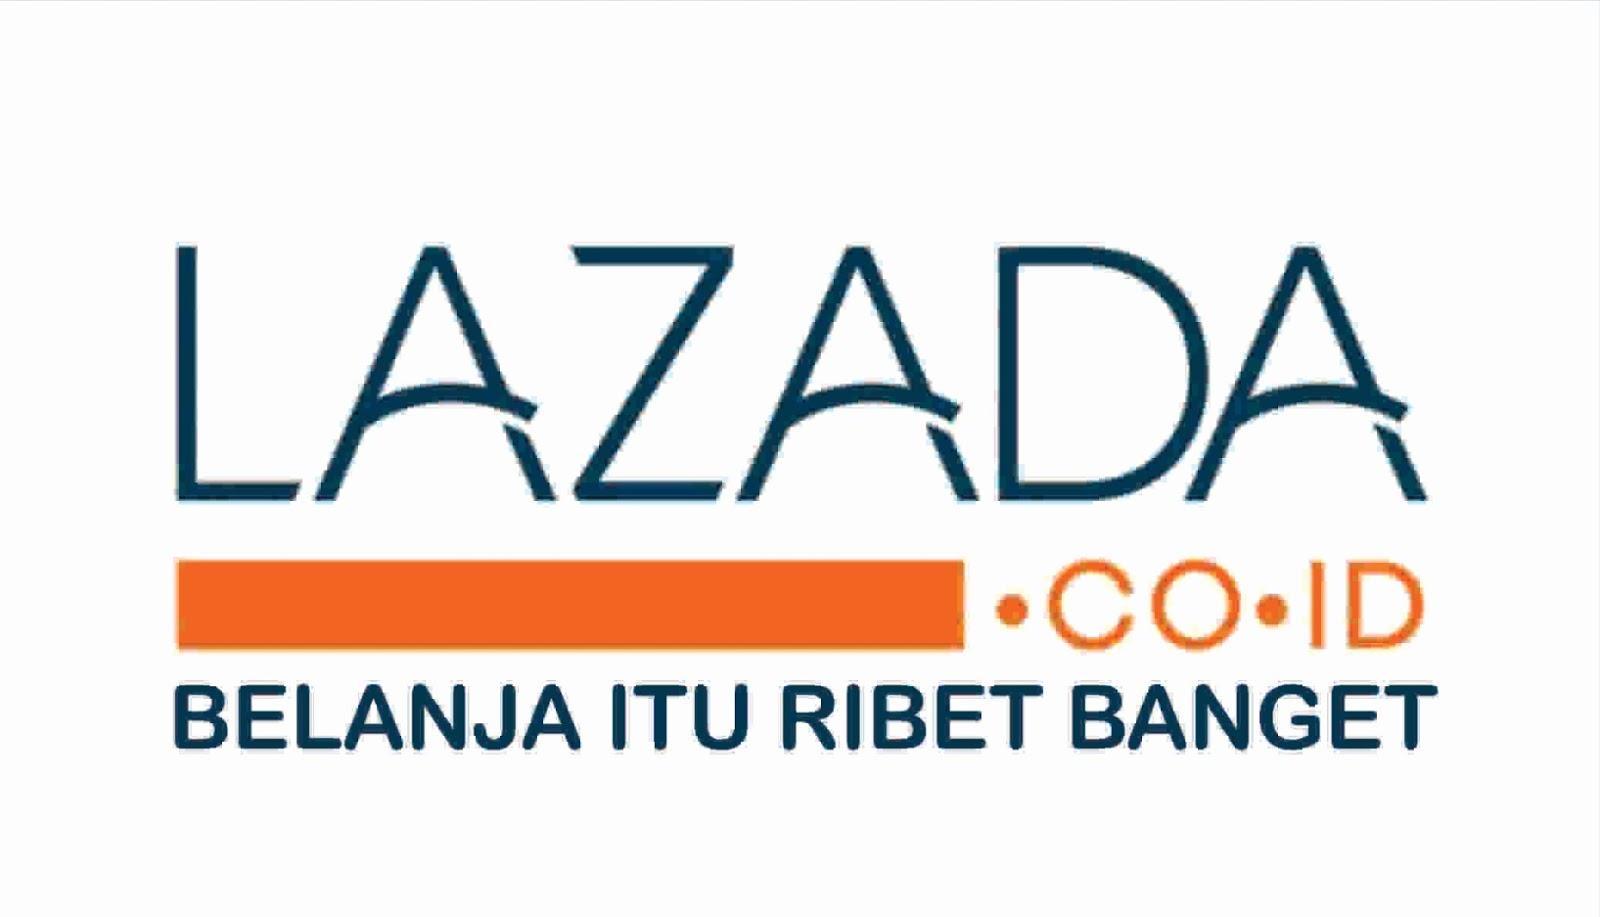 Pengalaman Pahit Belanja Di Lazada.co.id - Rudy Saputra | BLOG